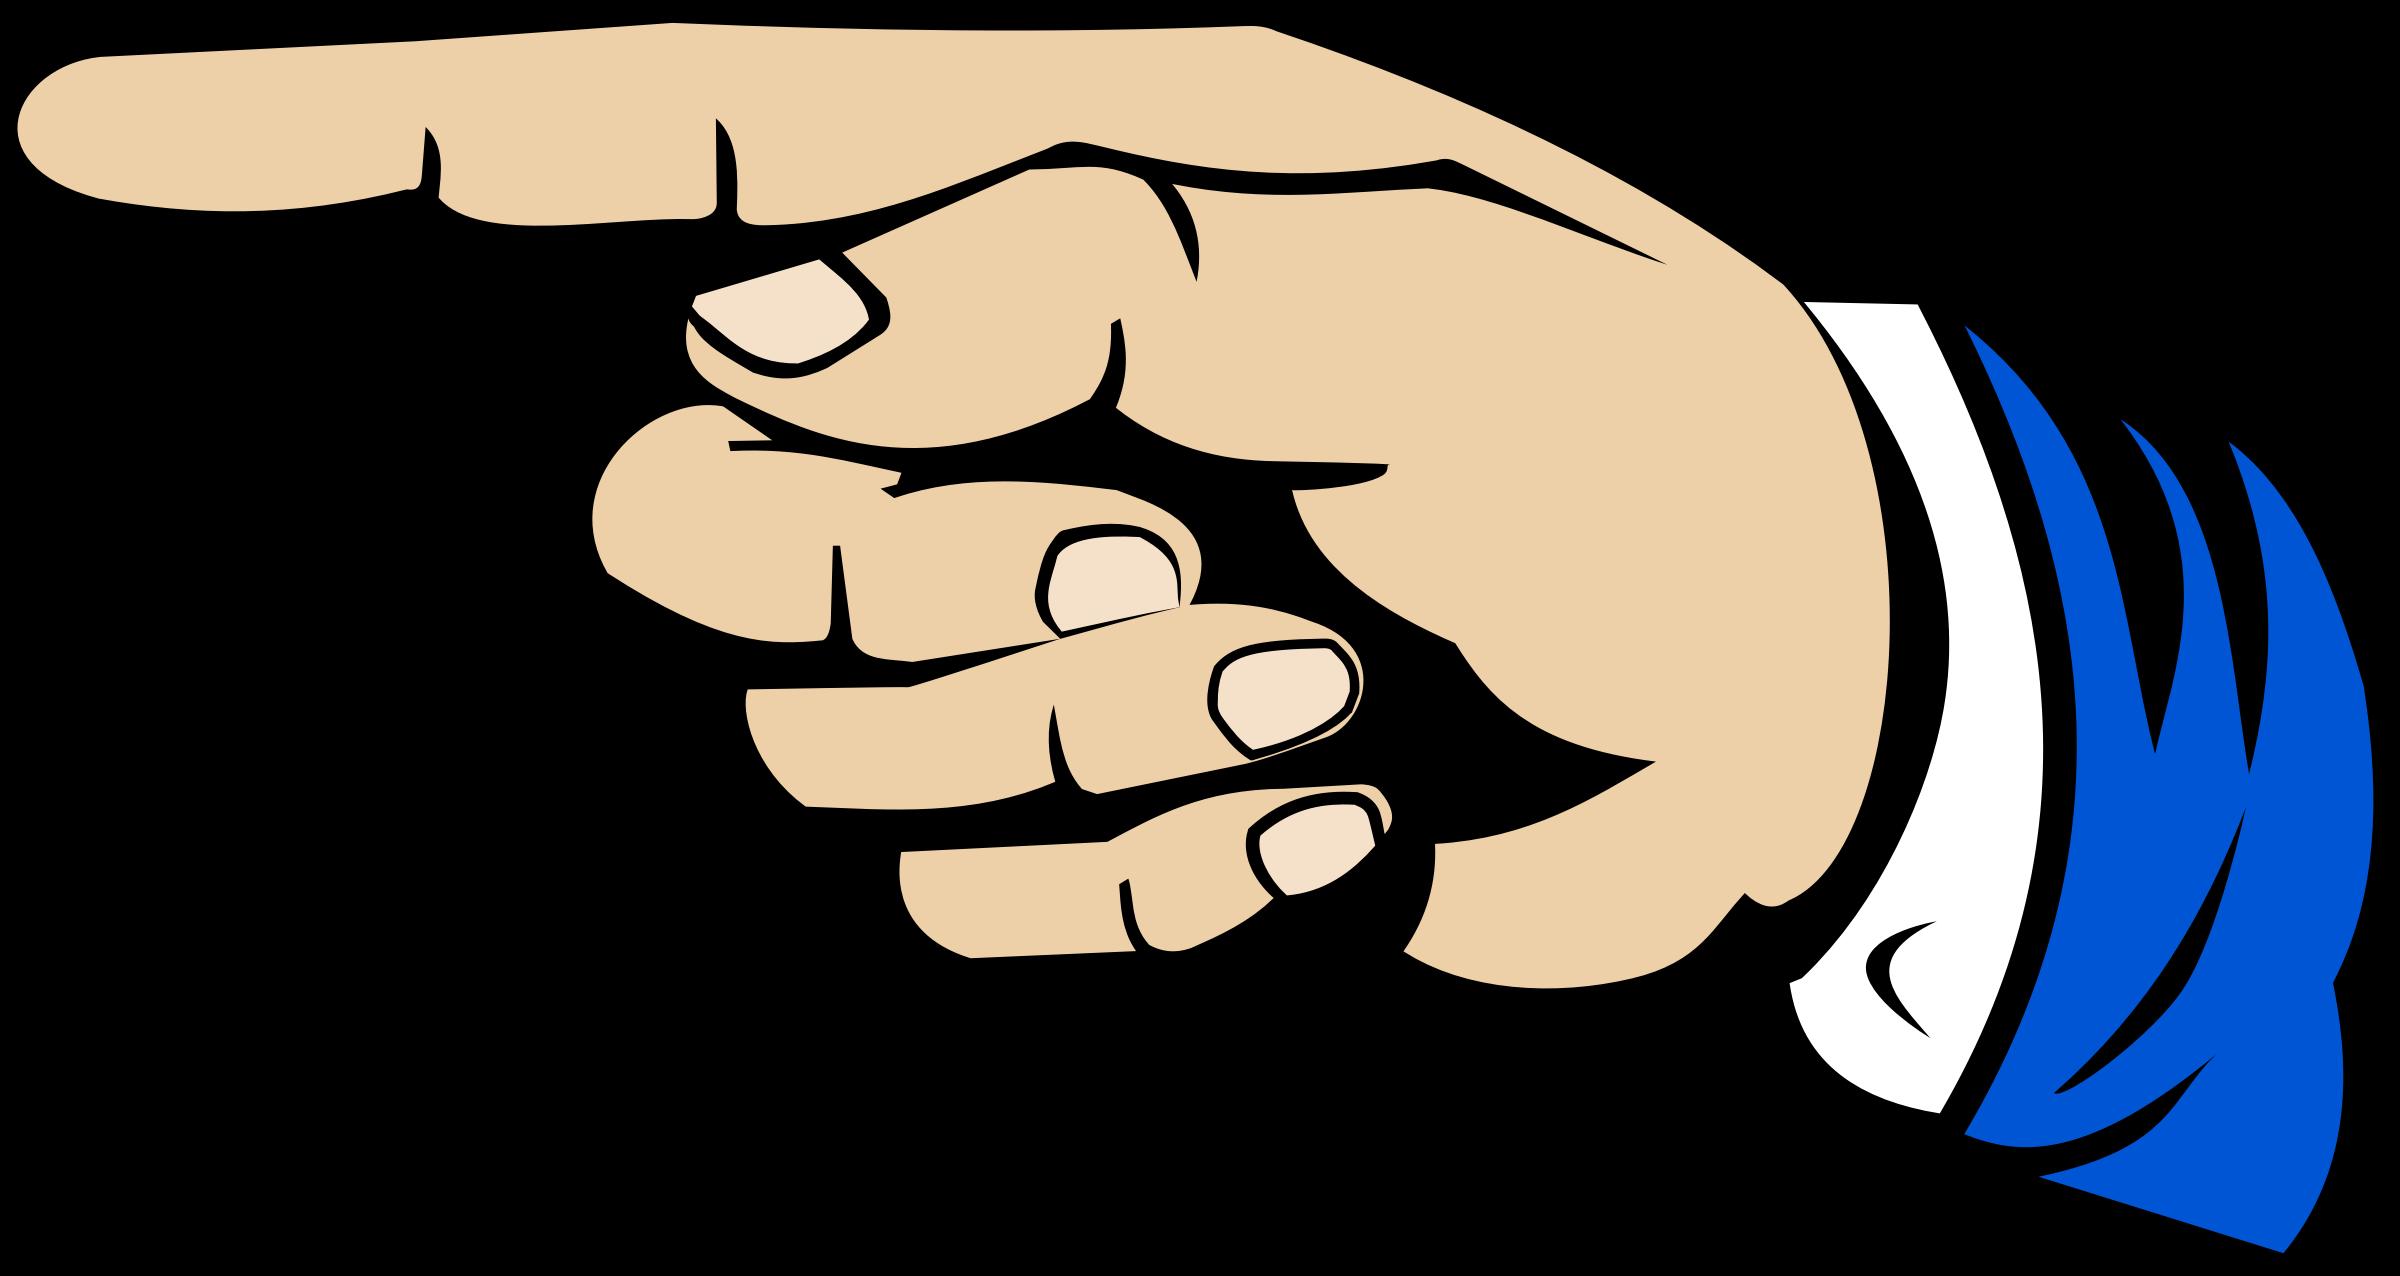 Finger clipart pointed finger, Finger pointed finger.